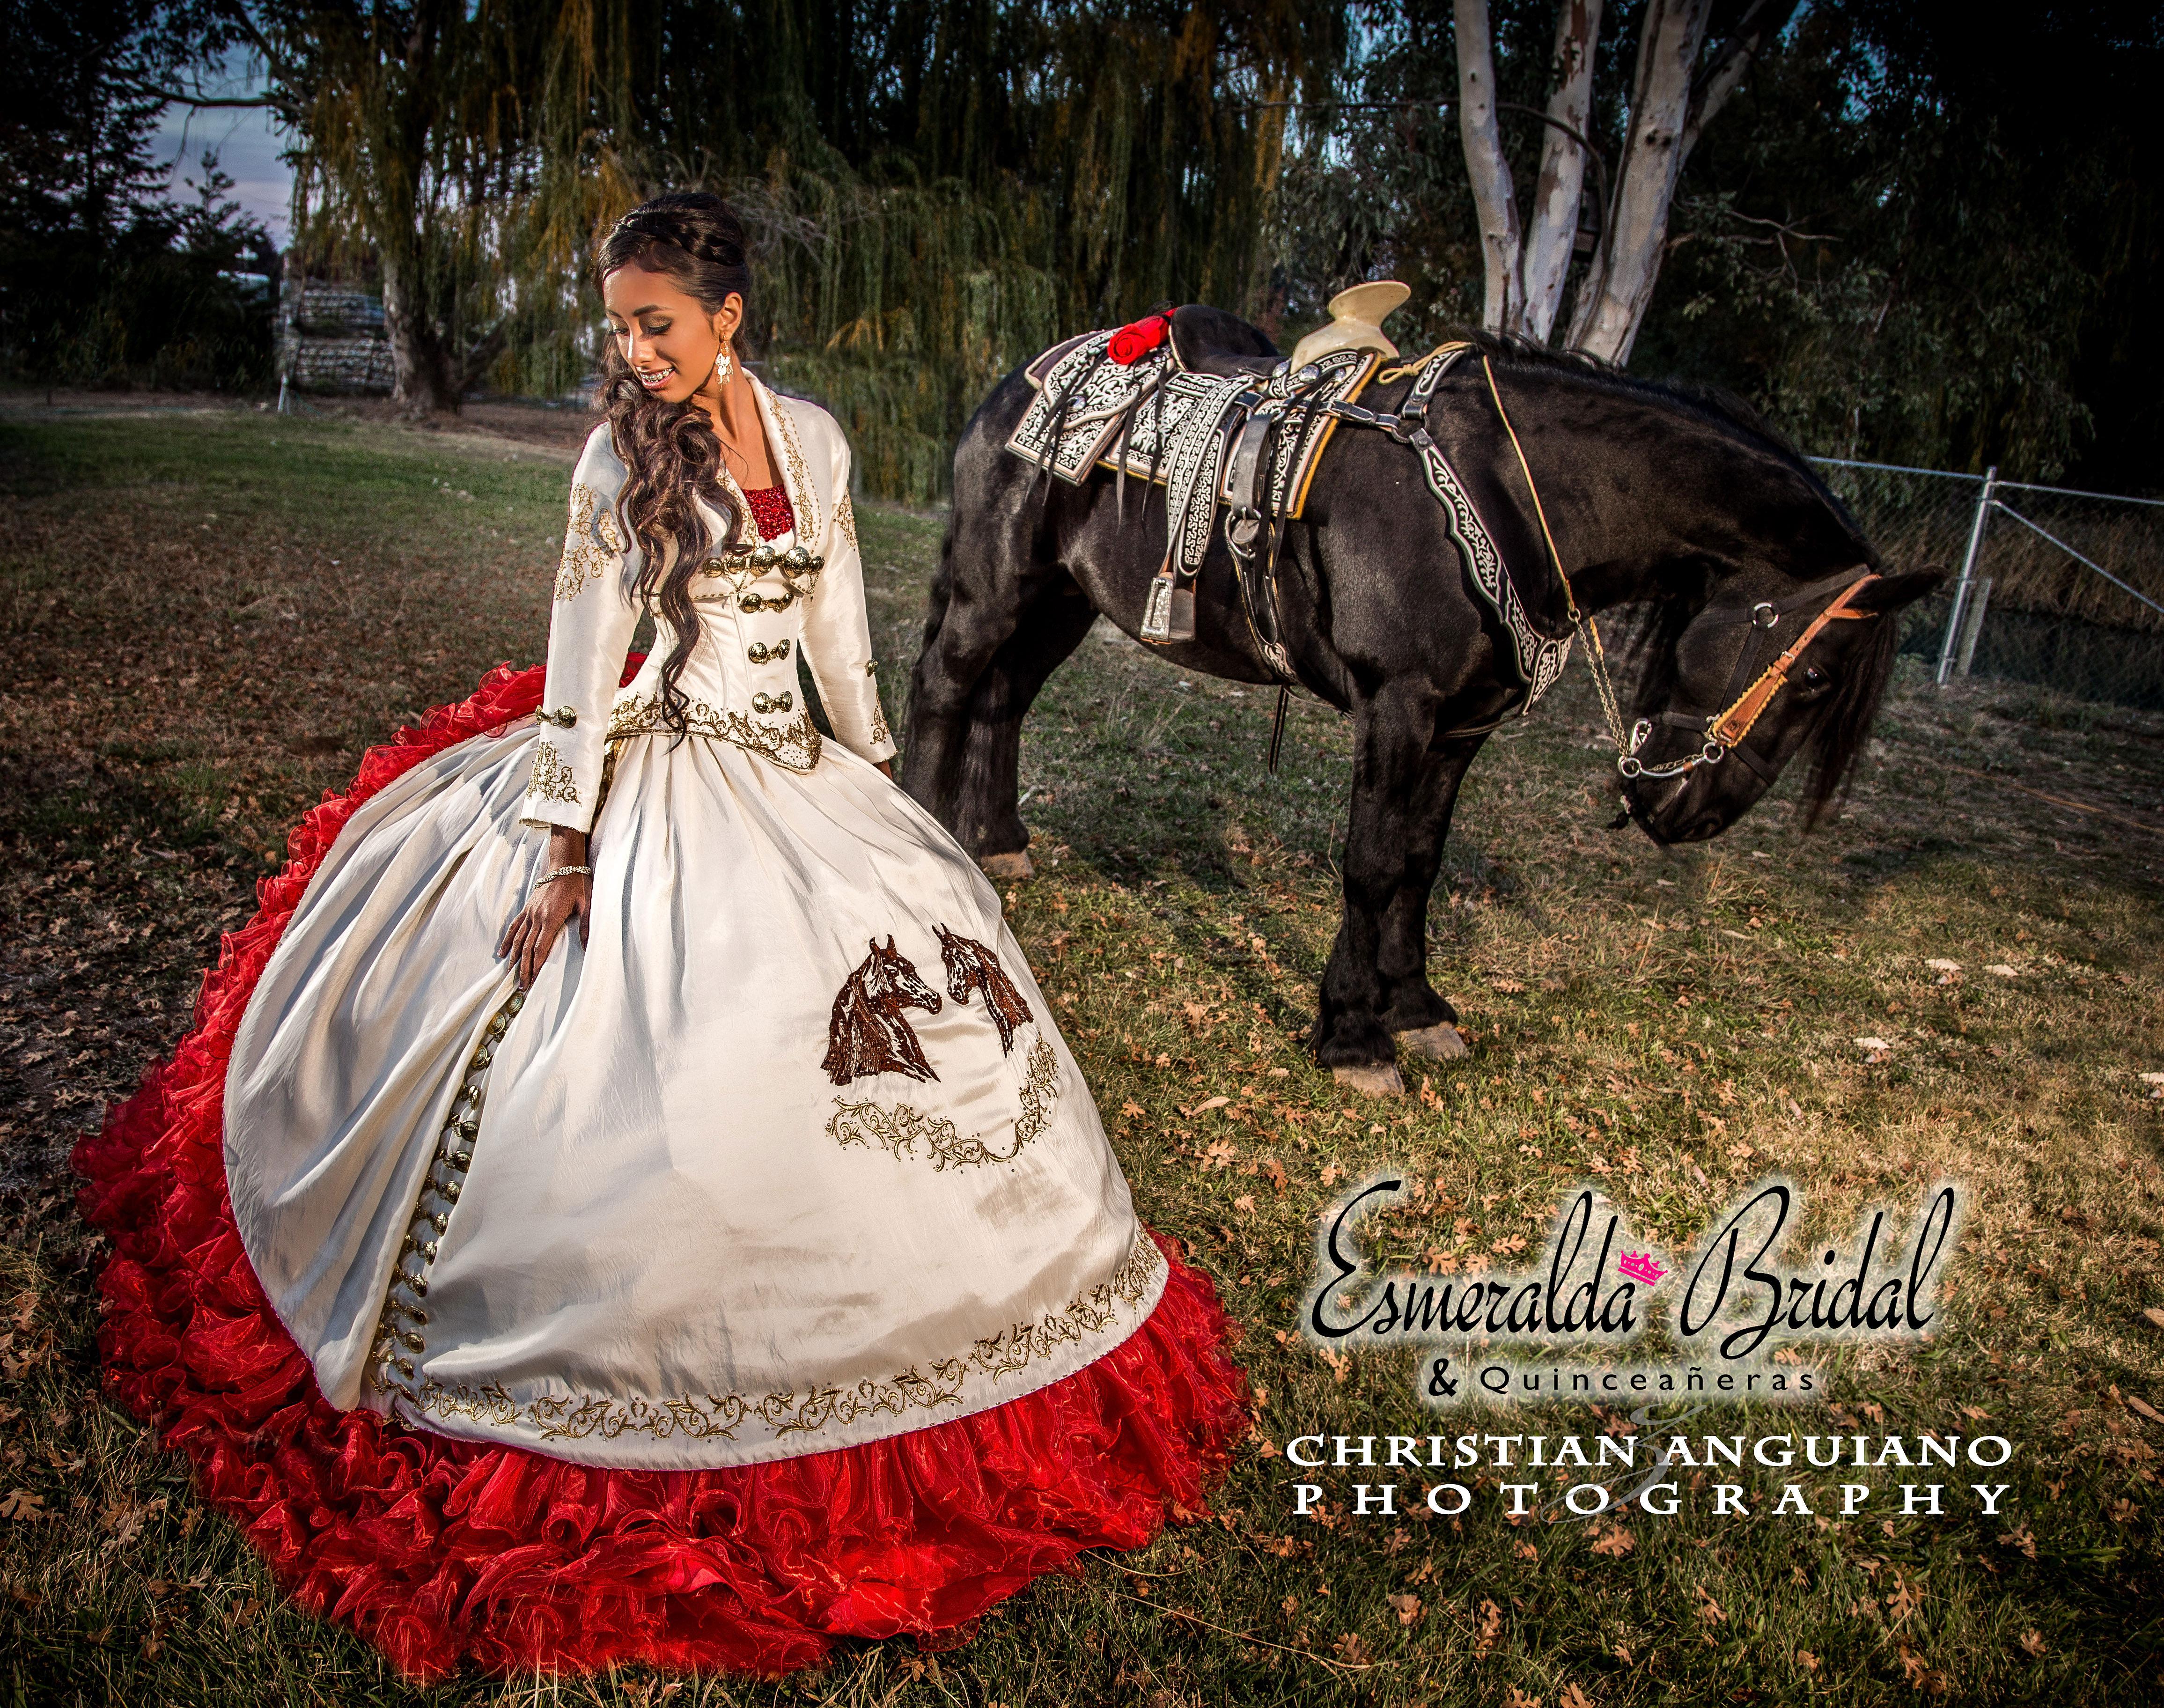 Esmeralda Bridal & Quinceañeras Best Quinceañera Dresses in the Market | Charra-dress-with-horse.jpg